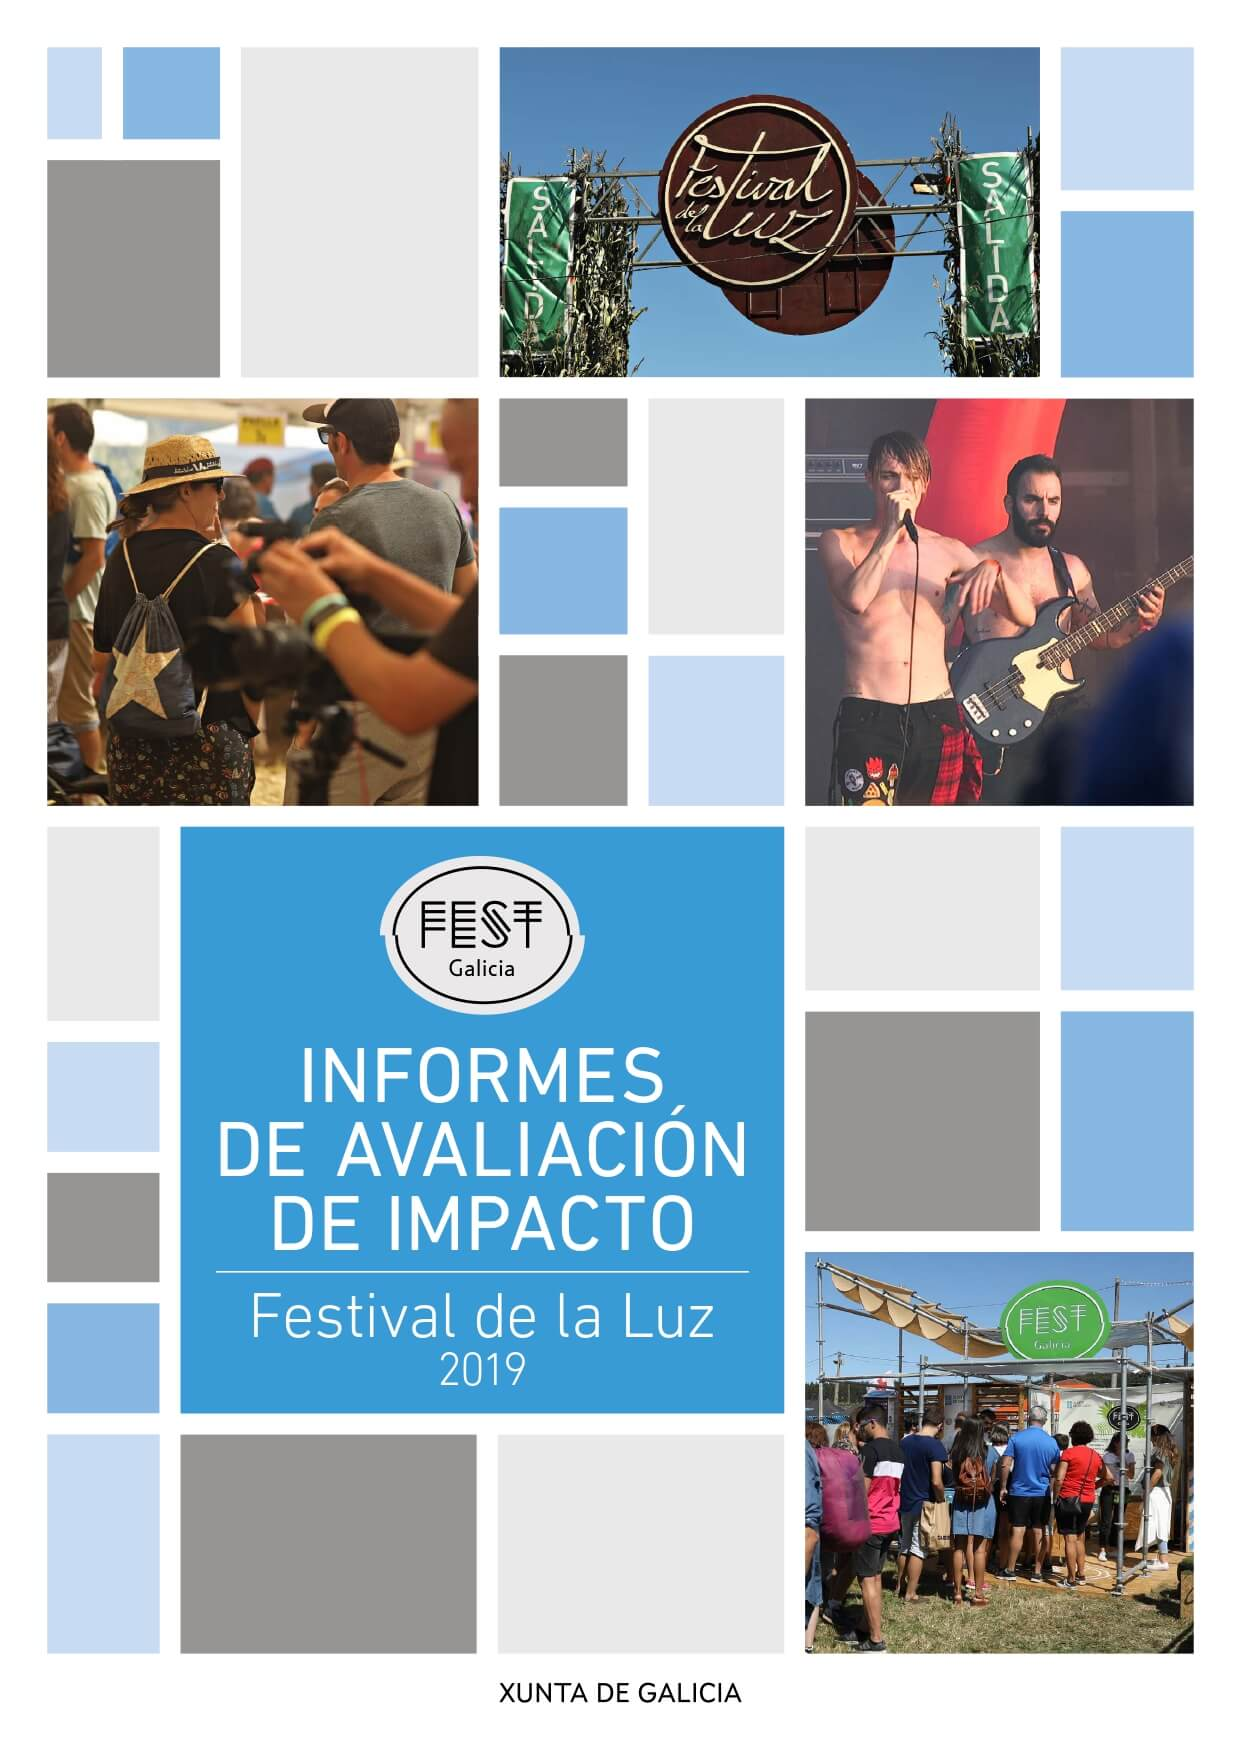 Fest Galicia informe Festival de la Luz 2019